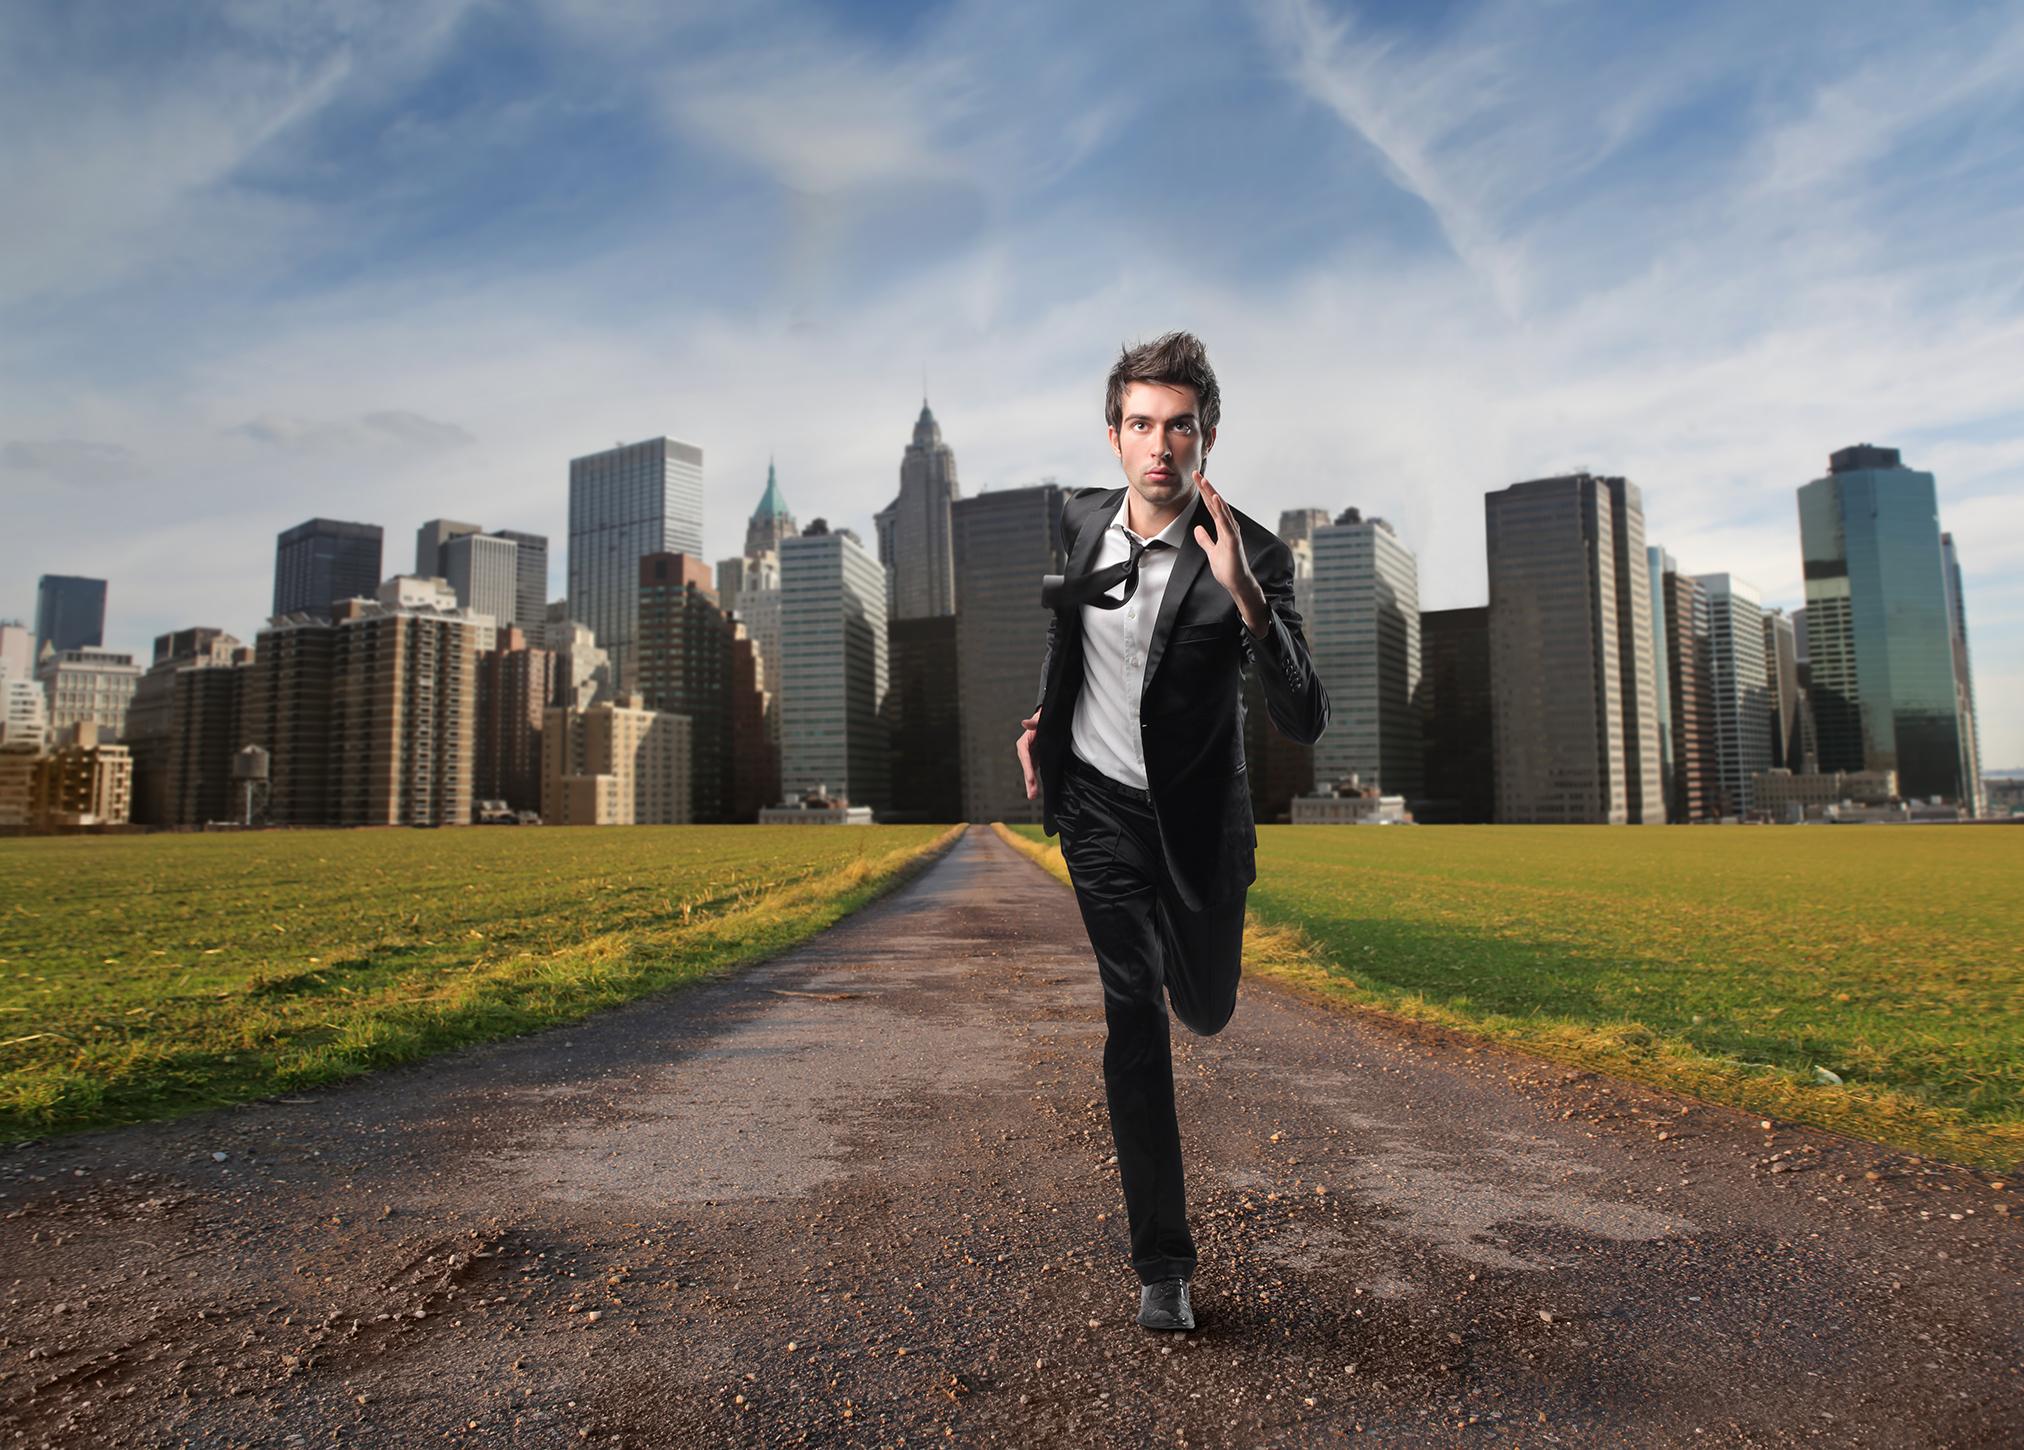 bieganie a stres forex